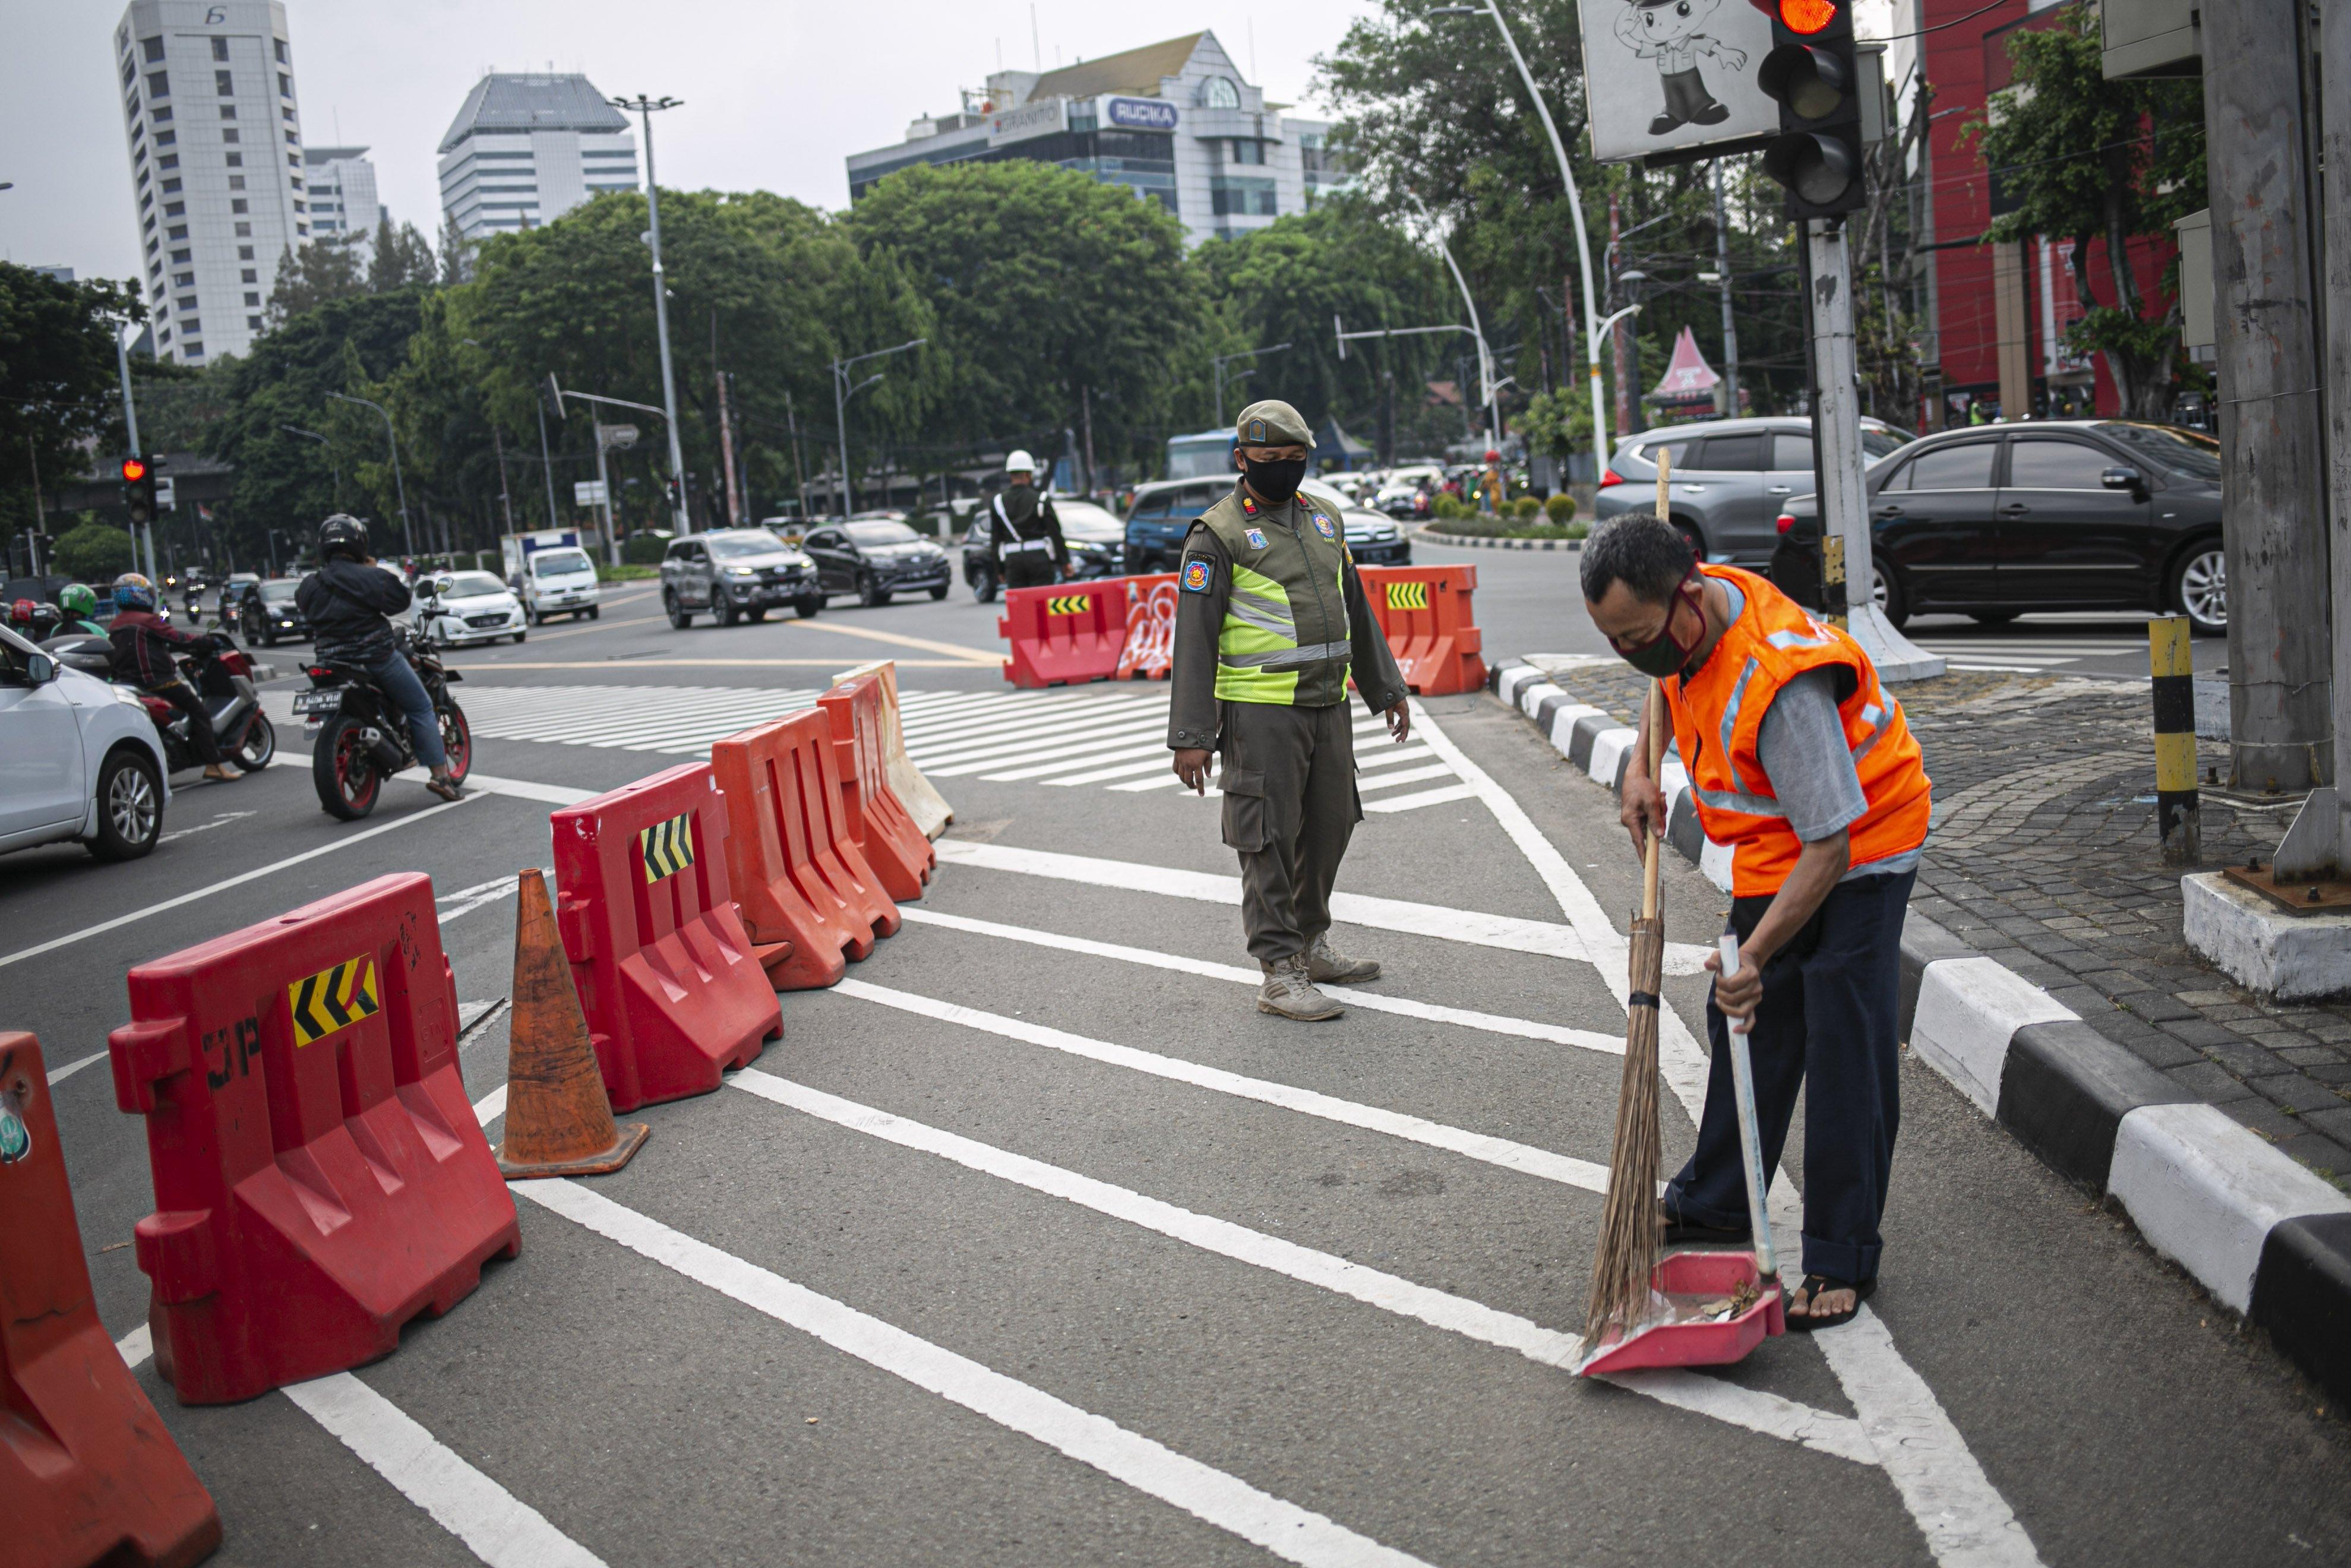 Warga pelanggar PSBB diberi sanksi menyapu jalan di Kawasan Tugu Tani, Jakarta Pusat, Senin (14/9/2020). Meski demikian, PSBB jilid II ini memiliki sejumlah aspek pembatasan yang berbeda bila dibandingkan dengan pelaksanaan yang dilakukan pada awal April. Sebab, ada beberapa area yang diizinkan beroperasi meski sangat terbatas.